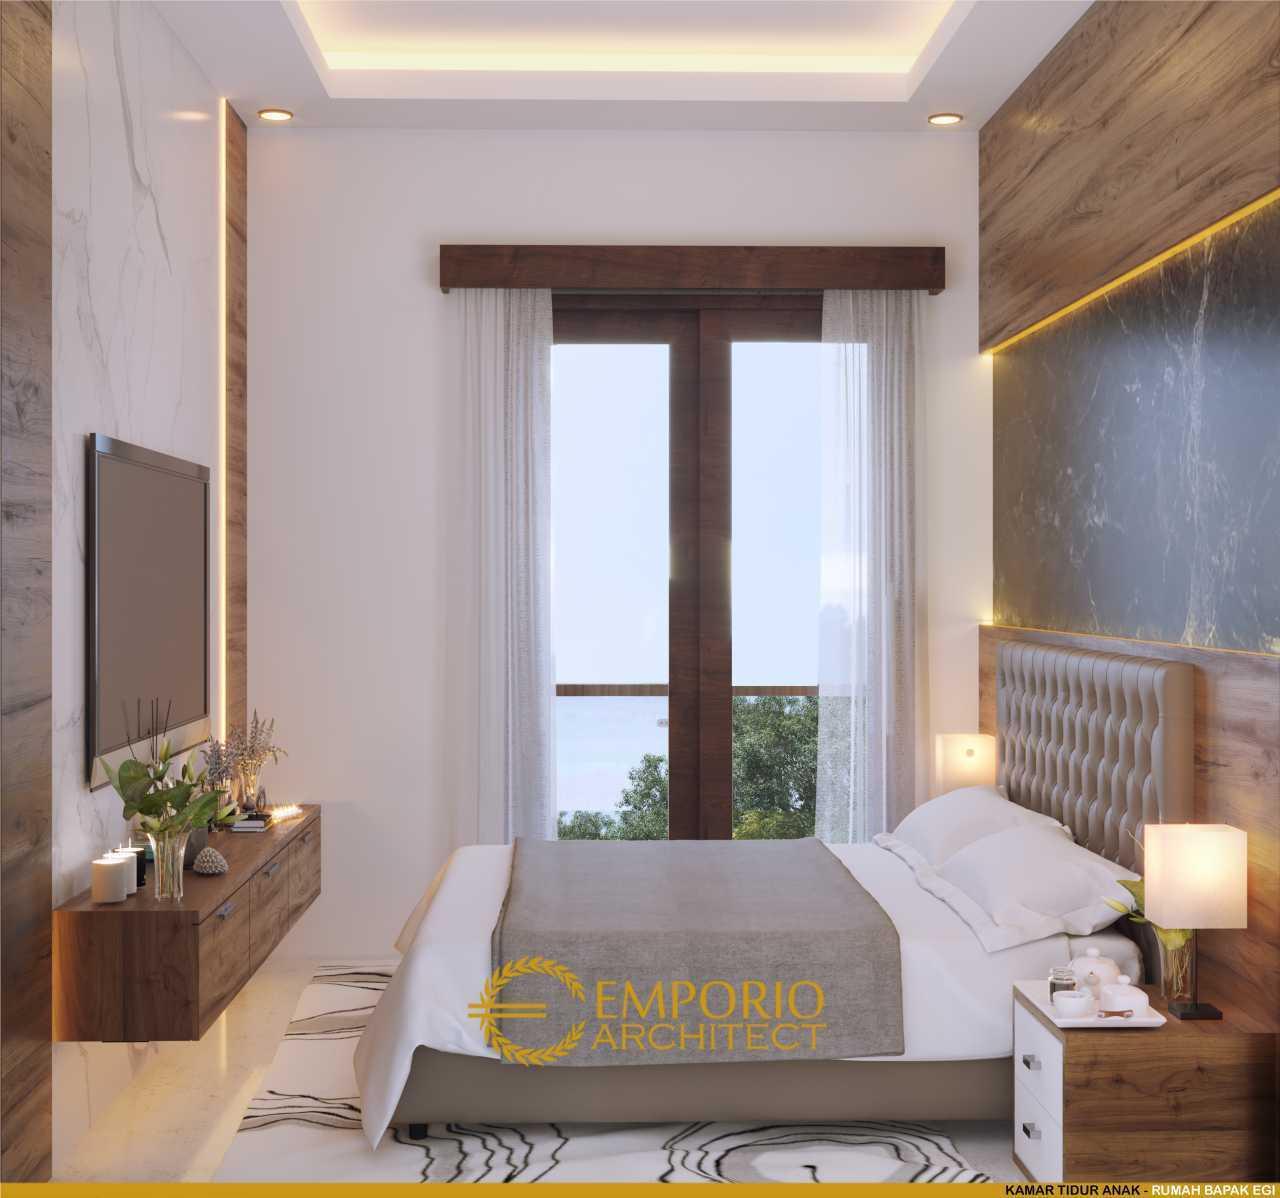 Emporio Architect Jasa Arsitek Denpasar Desain Rumah Modern 3 Lantai 734 @ Denpasar, Bali Kota Denpasar, Bali, Indonesia Kota Denpasar, Bali, Indonesia Emporio-Architect-Jasa-Arsitek-Denpasar-Desain-Rumah-Modern-3-Lantai-734-Denpasar-Bali  93969